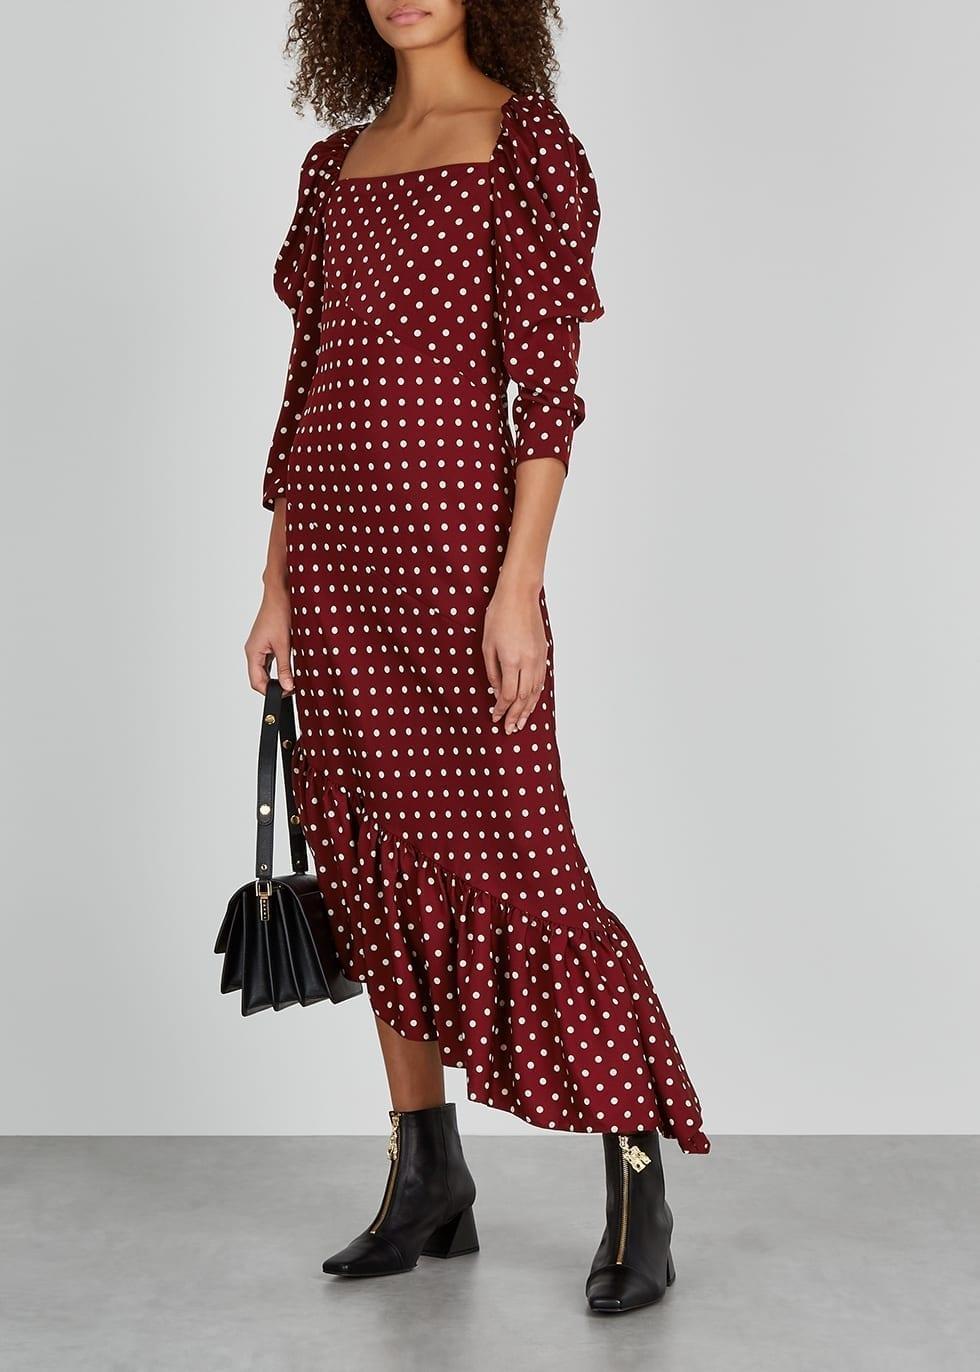 PUSHBUTTON Burgundy Polka-dot Satin Midi Dress